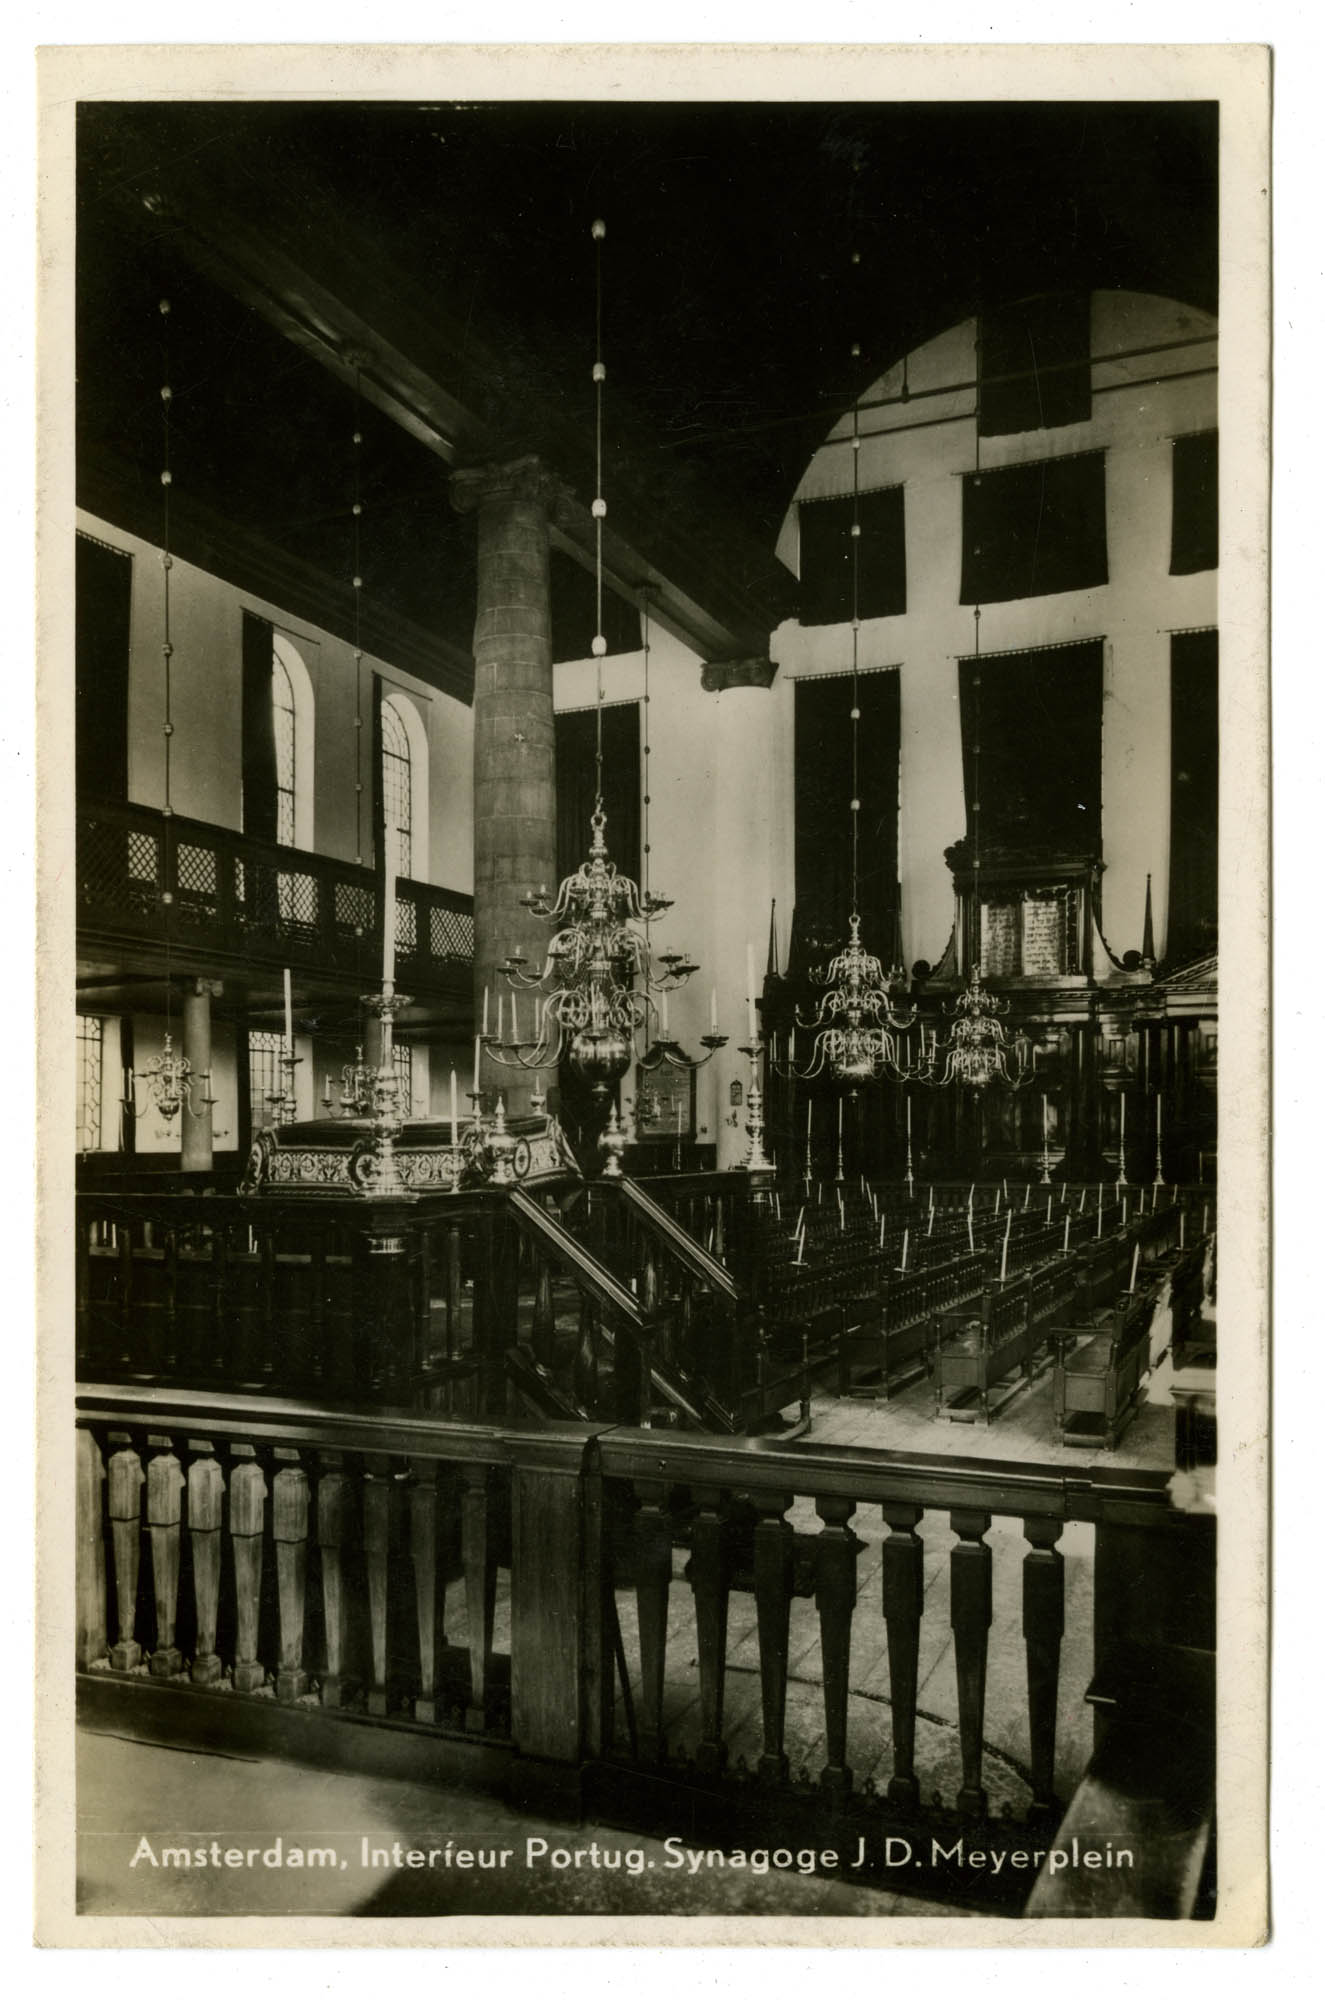 Amsterdam, Interieur Portug. Synagoge, J.D. Meyerplein